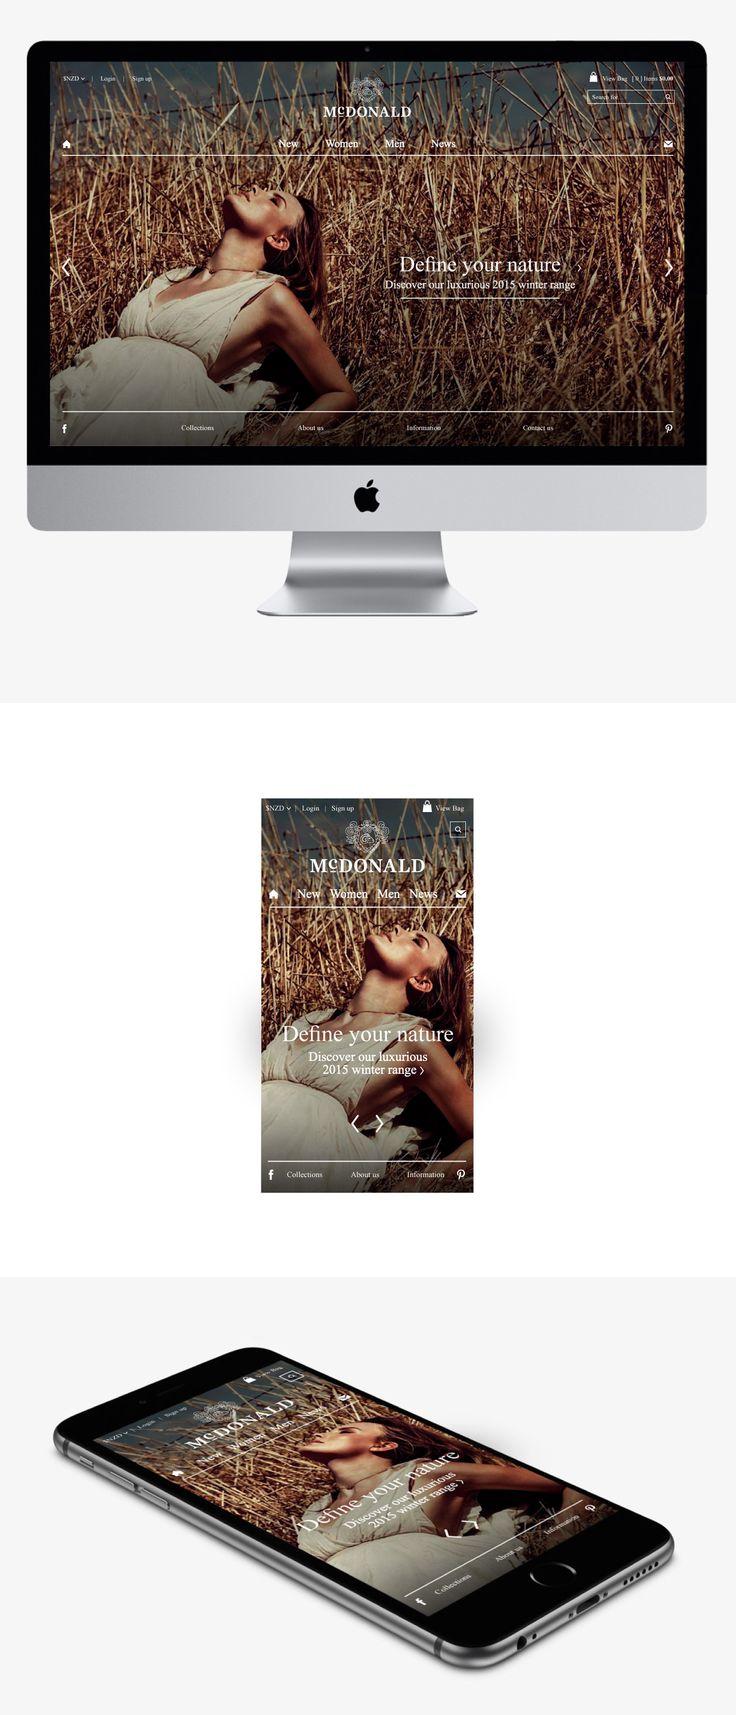 McDonald e-commerce website design and development